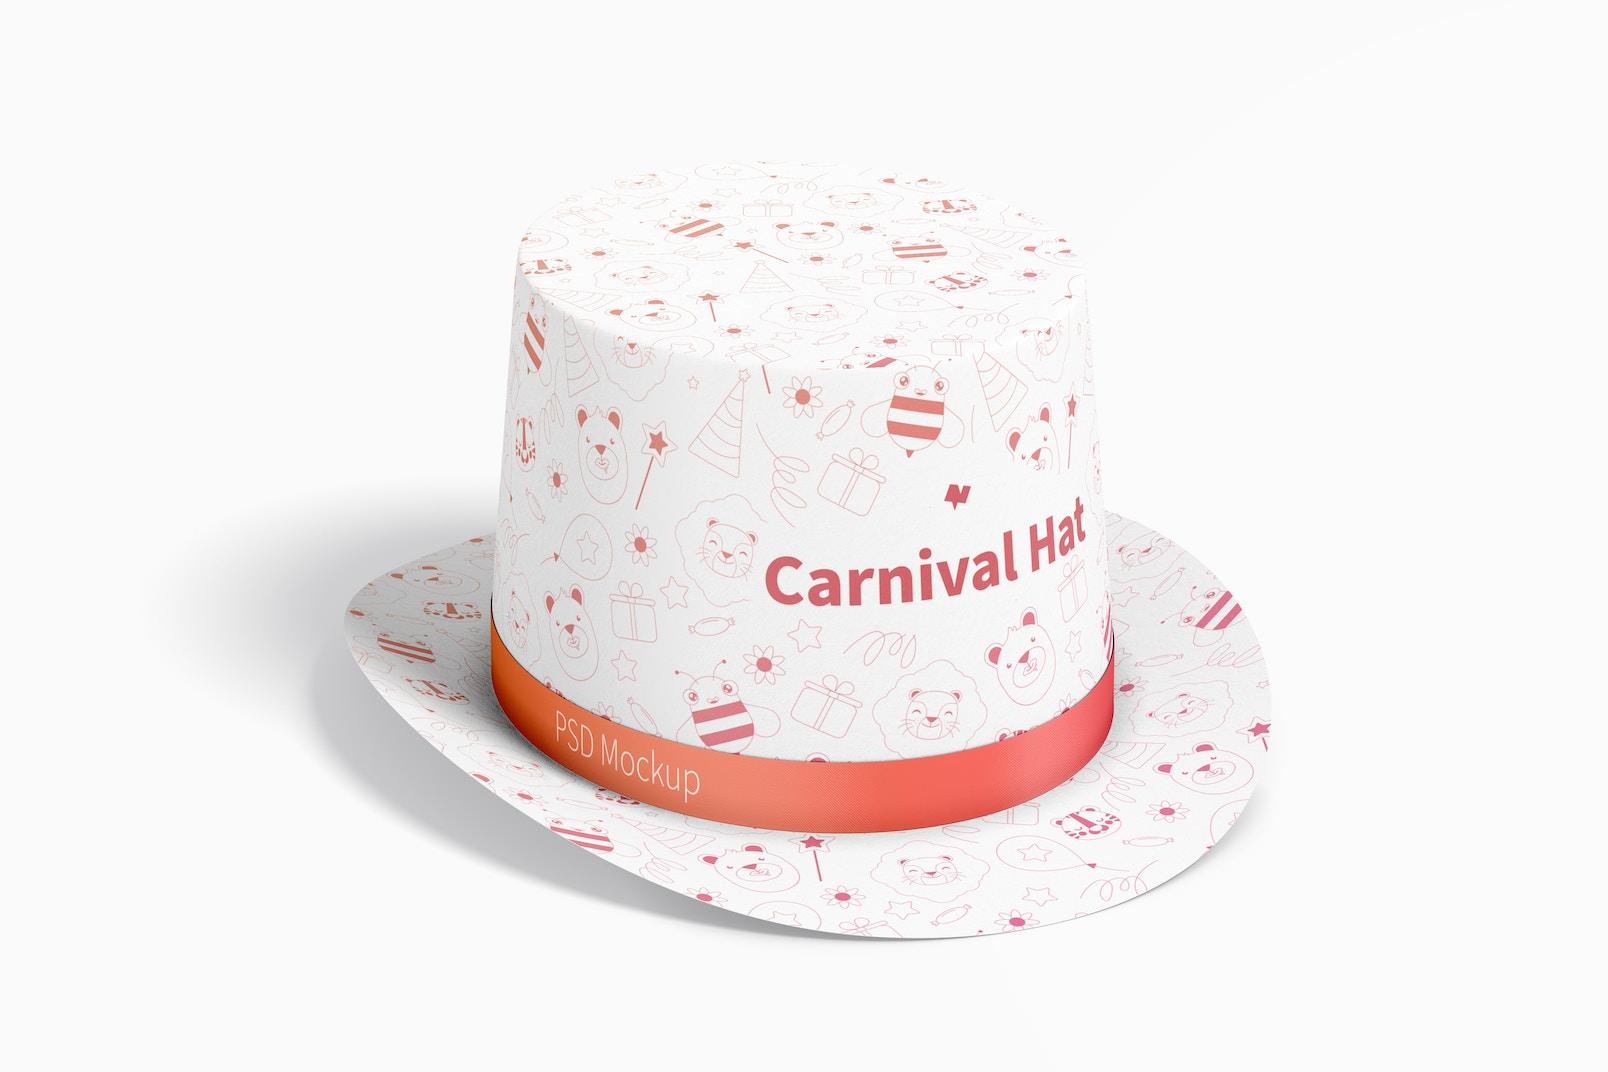 Carnival Hat Mockup, Perspective